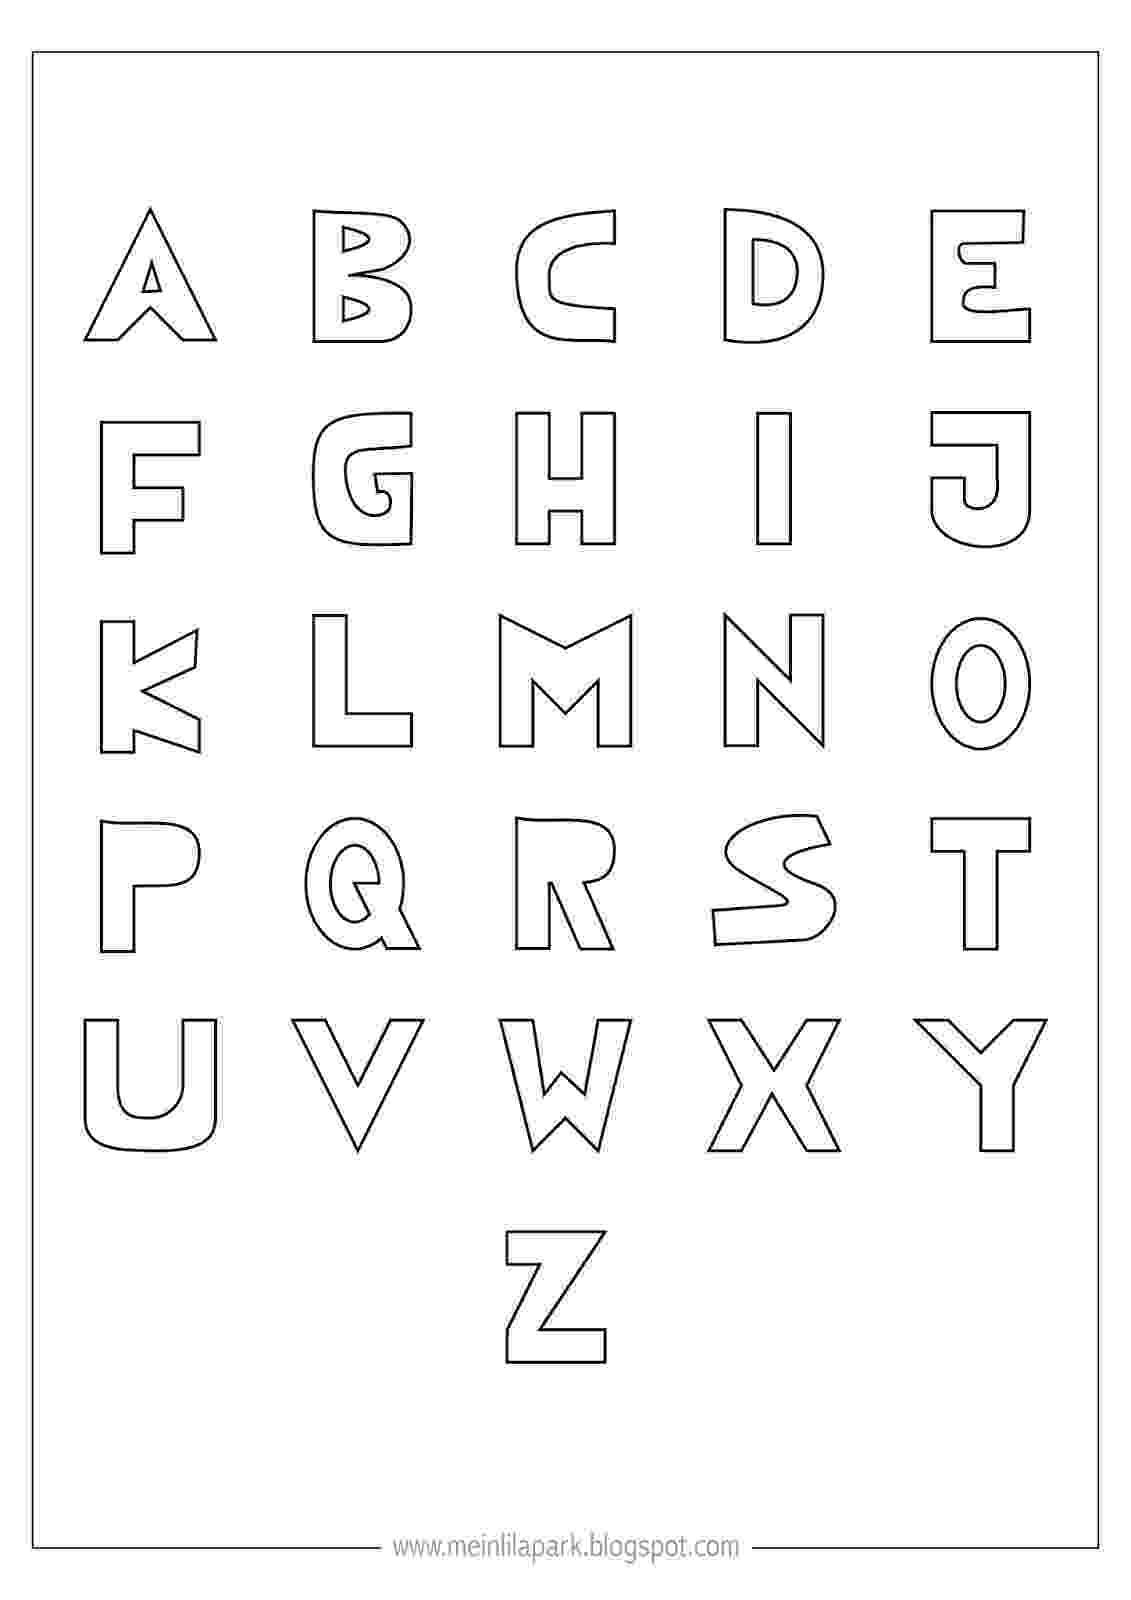 coloring pictures of alphabet letters alphabet coloring pages bestofcoloring coloring sheets alphabet of coloring letters pictures